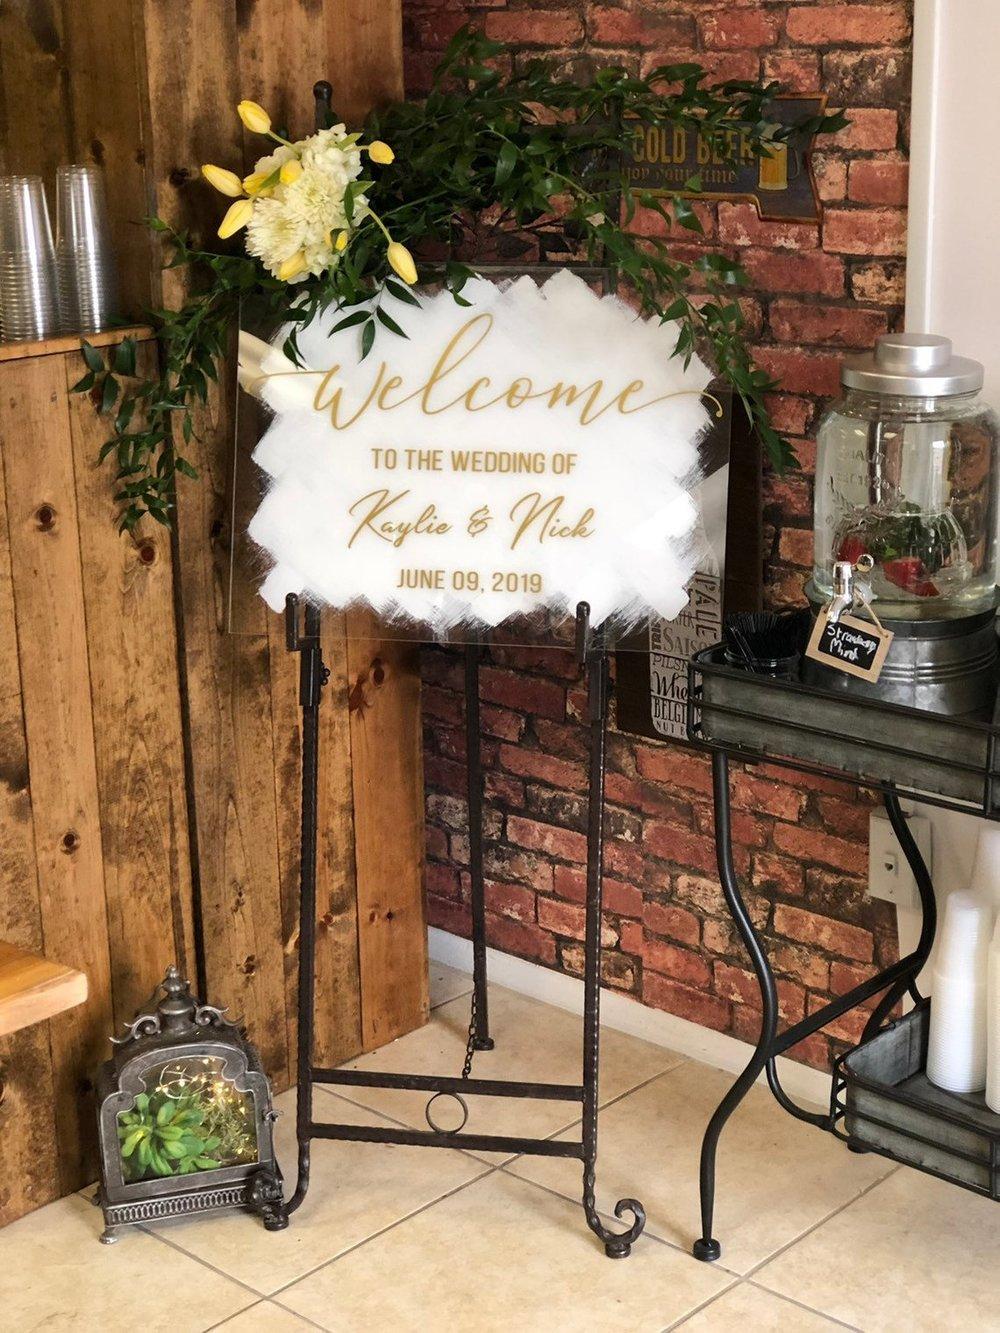 Acrylic Wedding Signs - The Overwhelmed Bride Wedding Blog